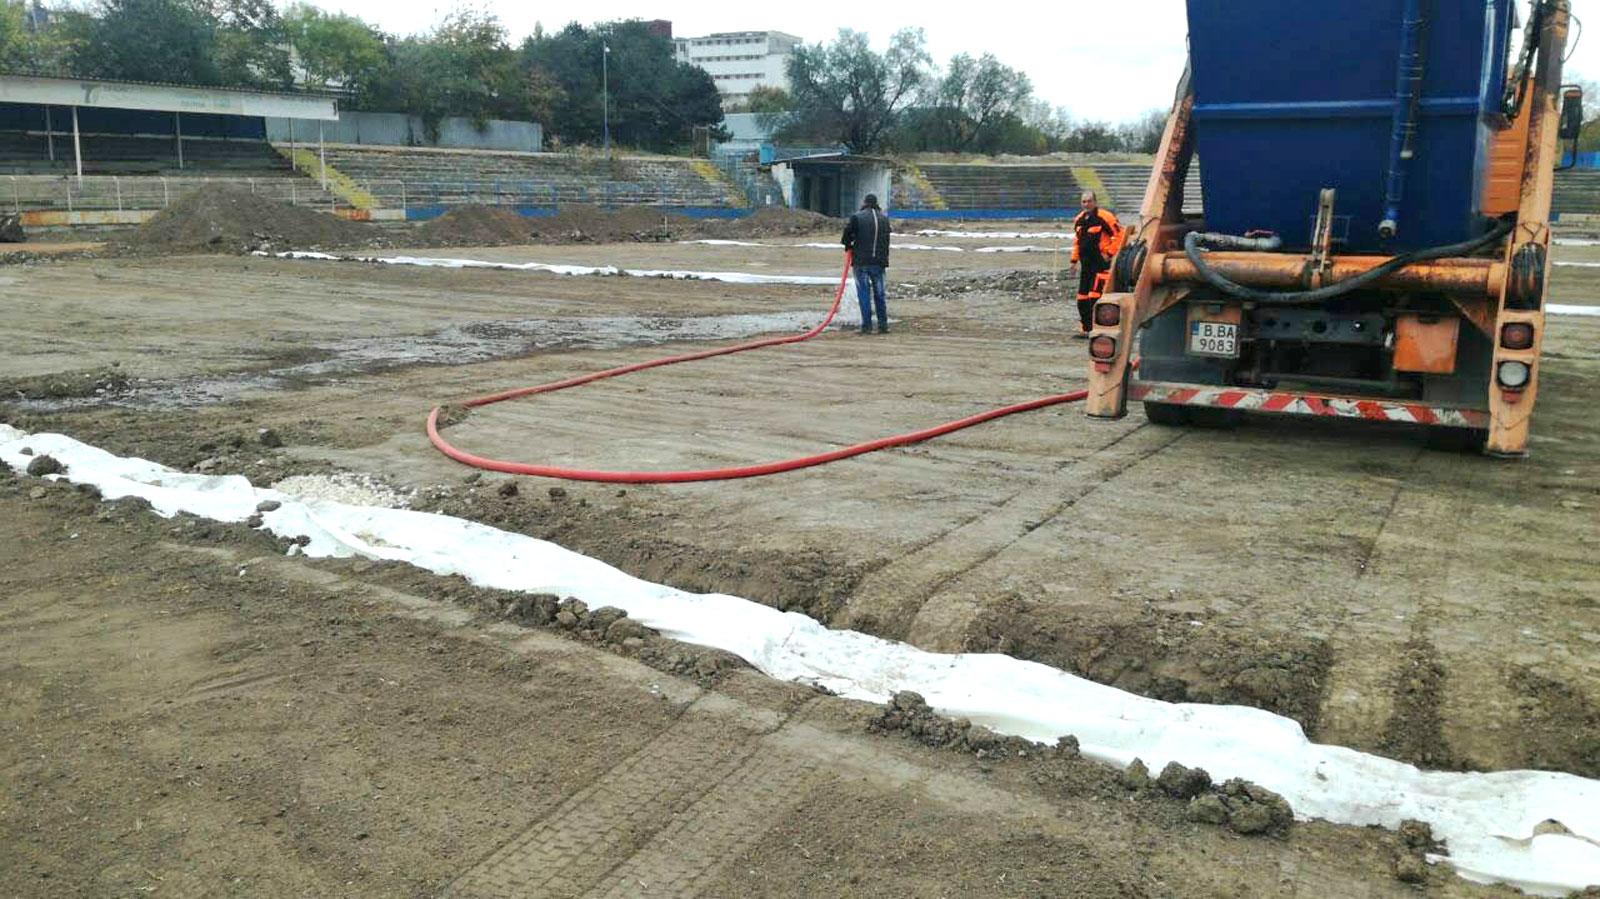 Стадион Спартак Варна - изграждане и затревяване